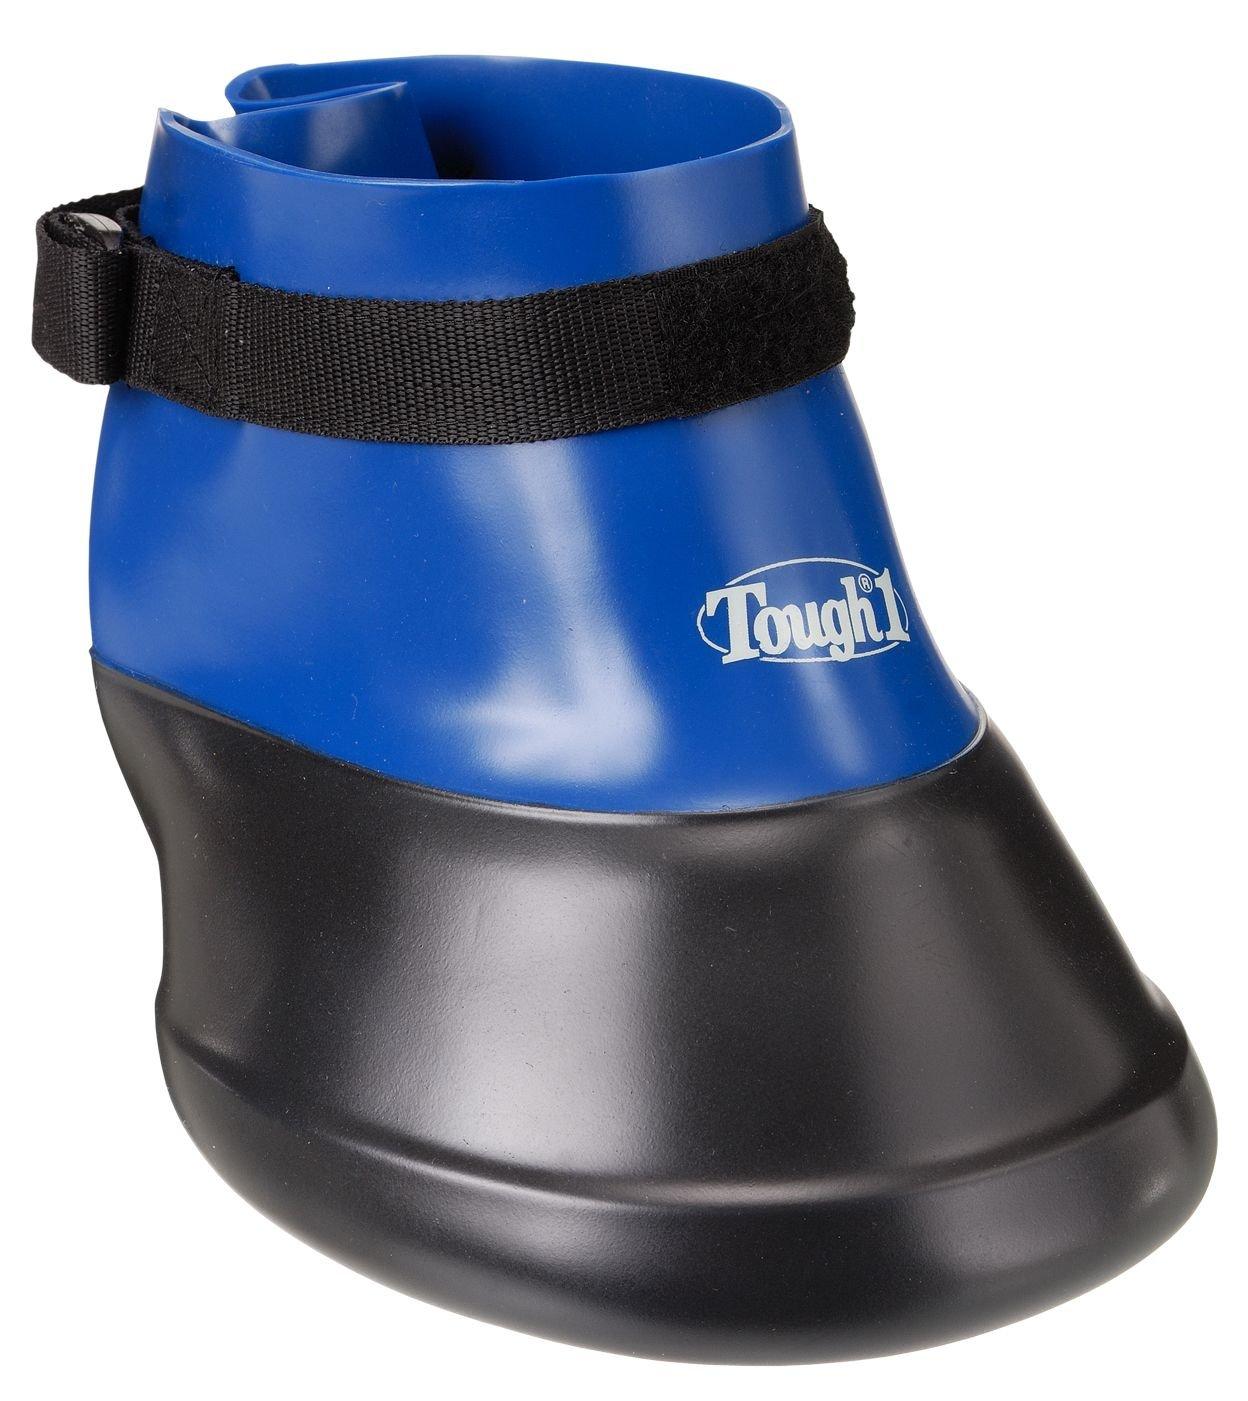 Tough 1 Protect O Boot, Royal Blue, Large